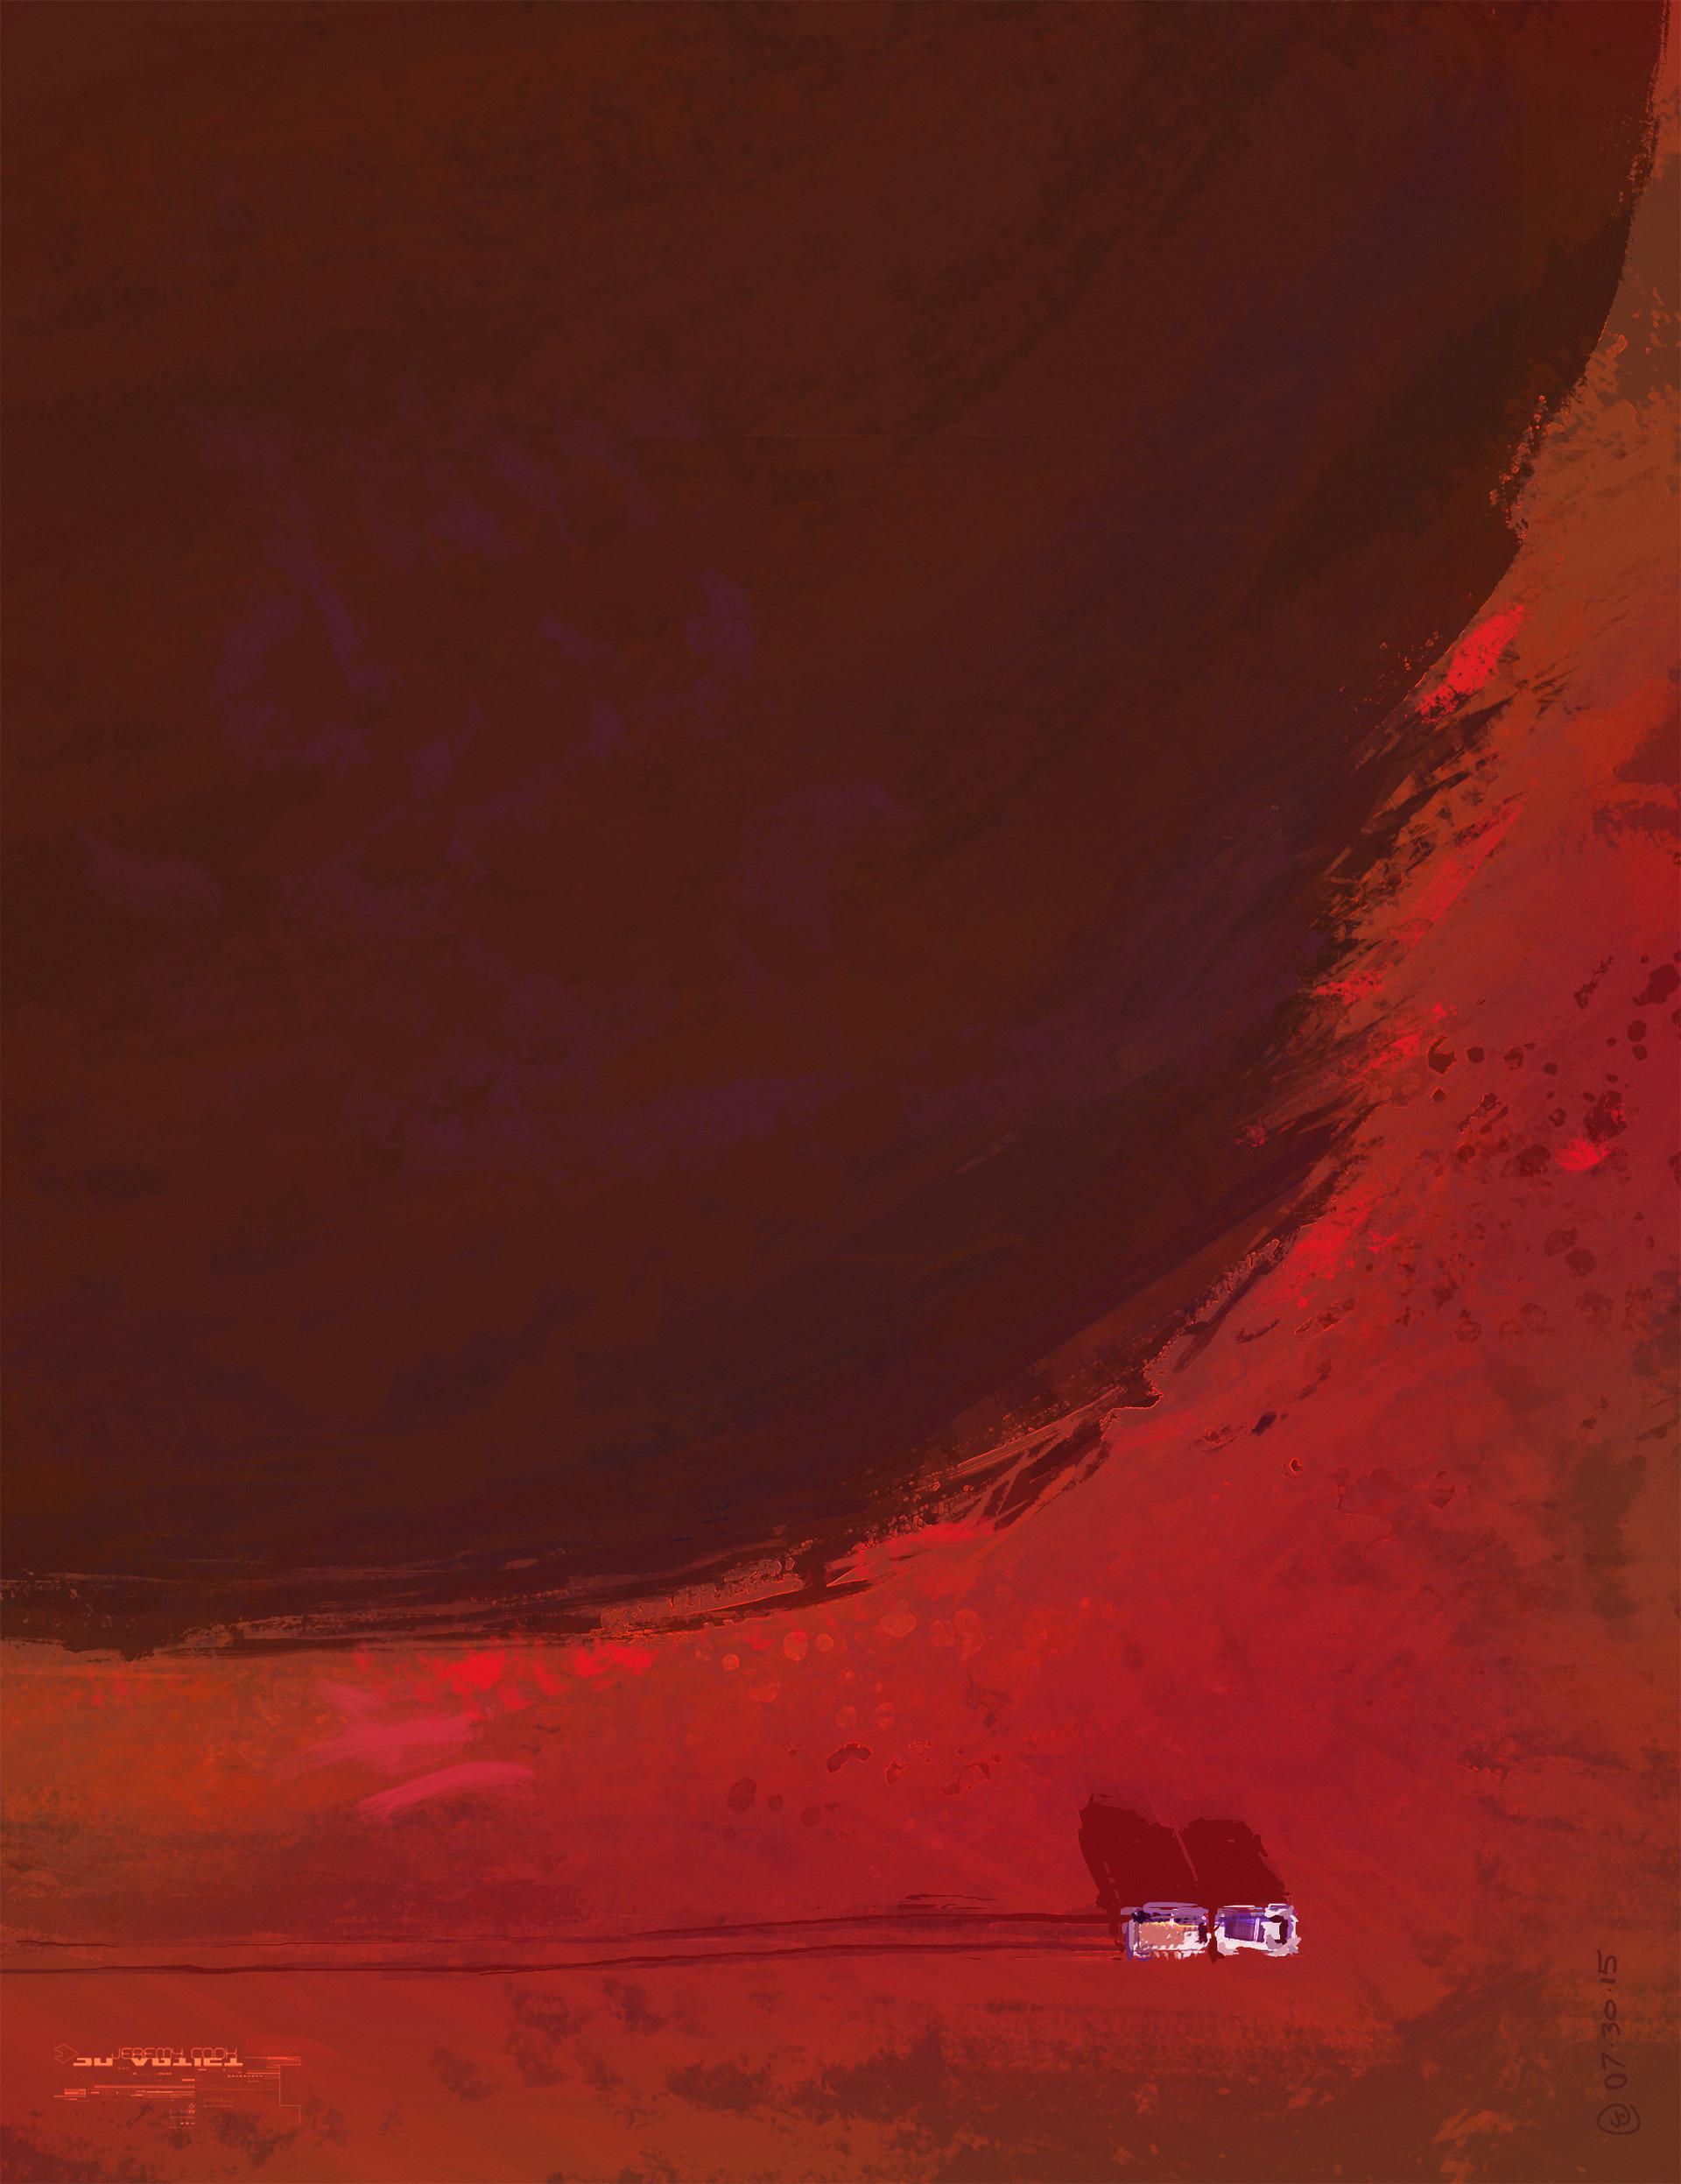 ArtStation - Jeremy Cook - The Martian